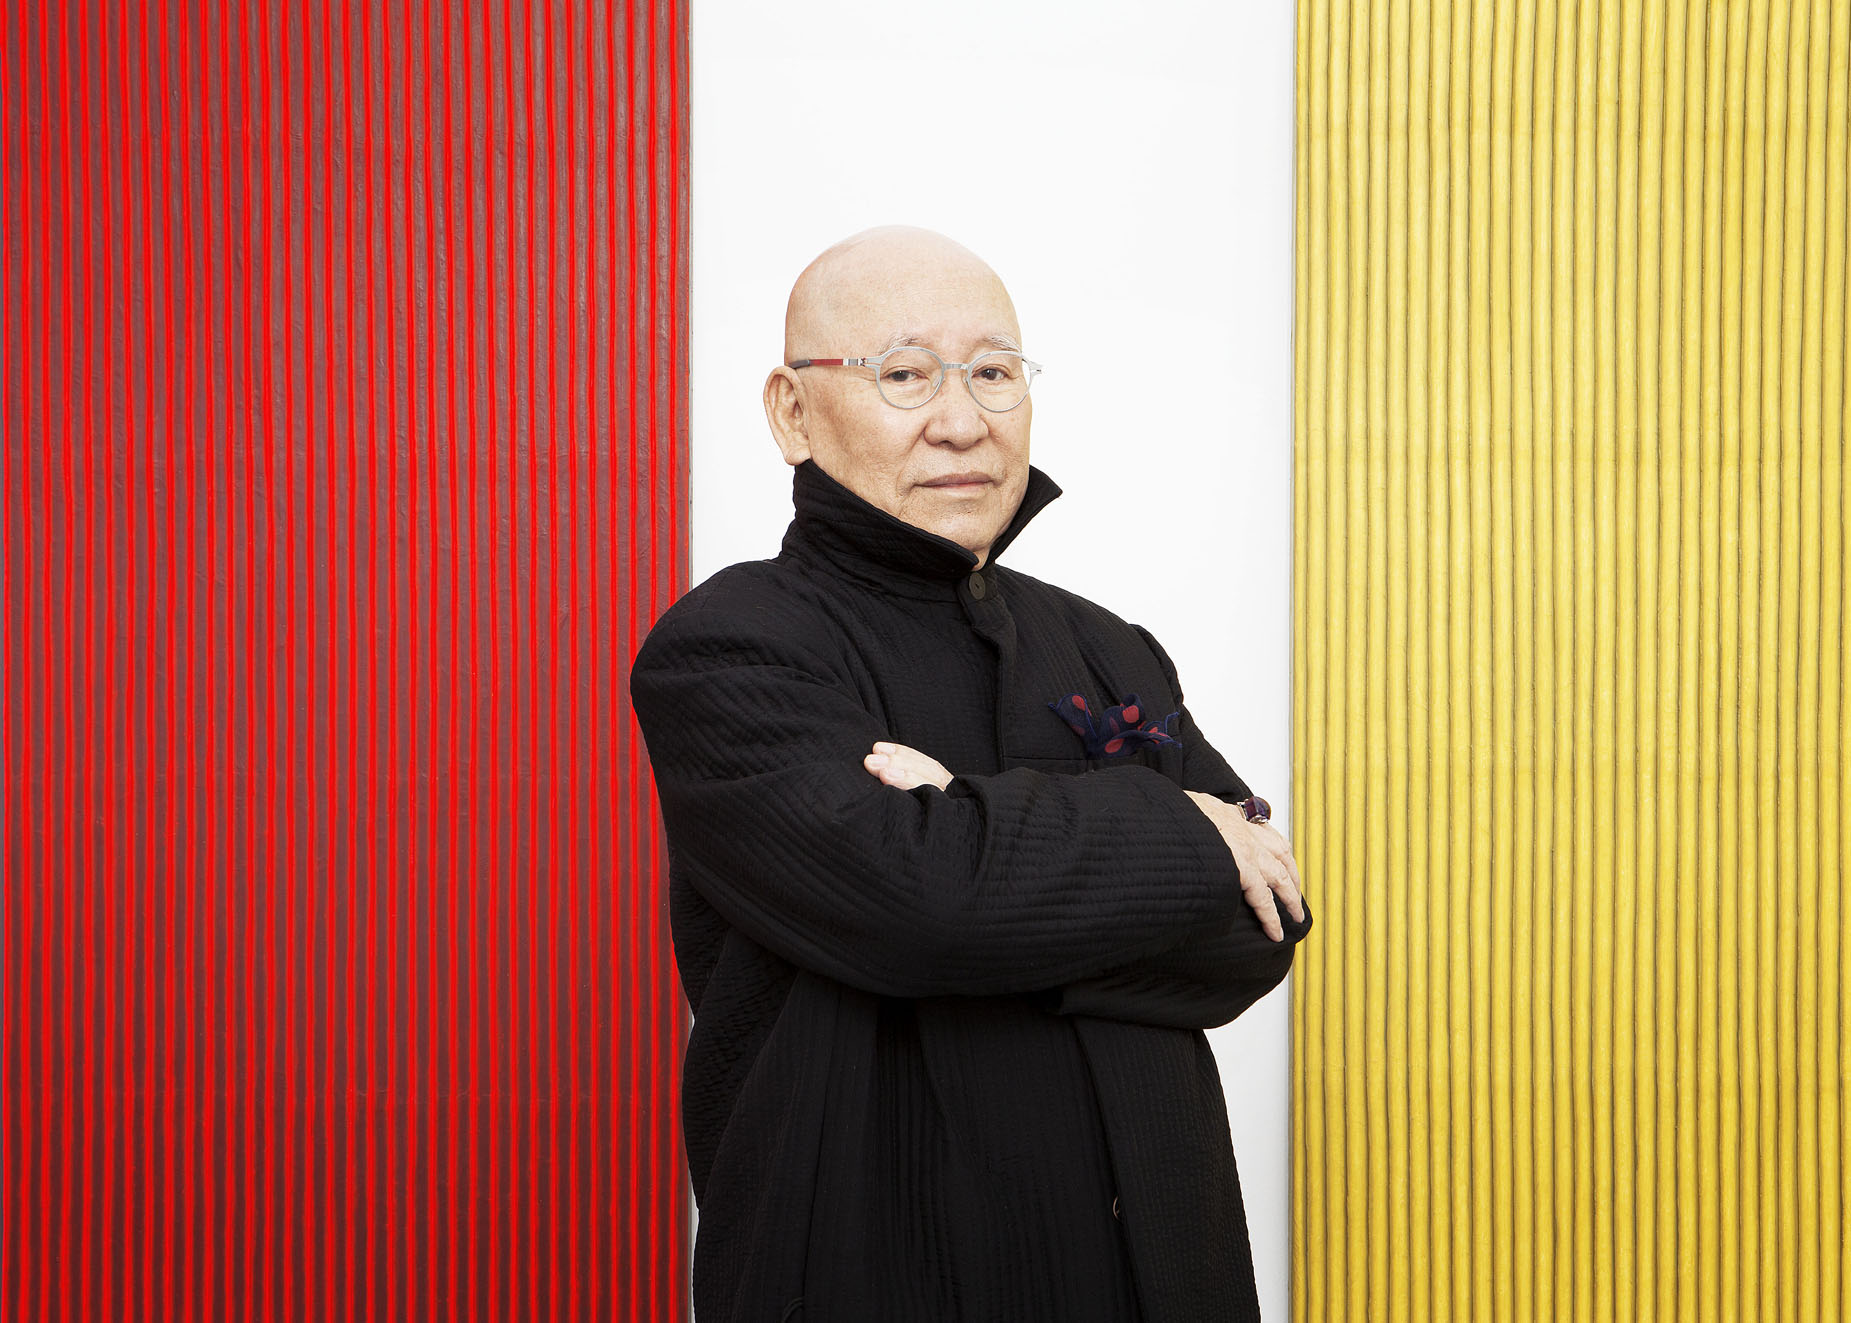 Park Seo-Bo talks painting and Takashi Murakami